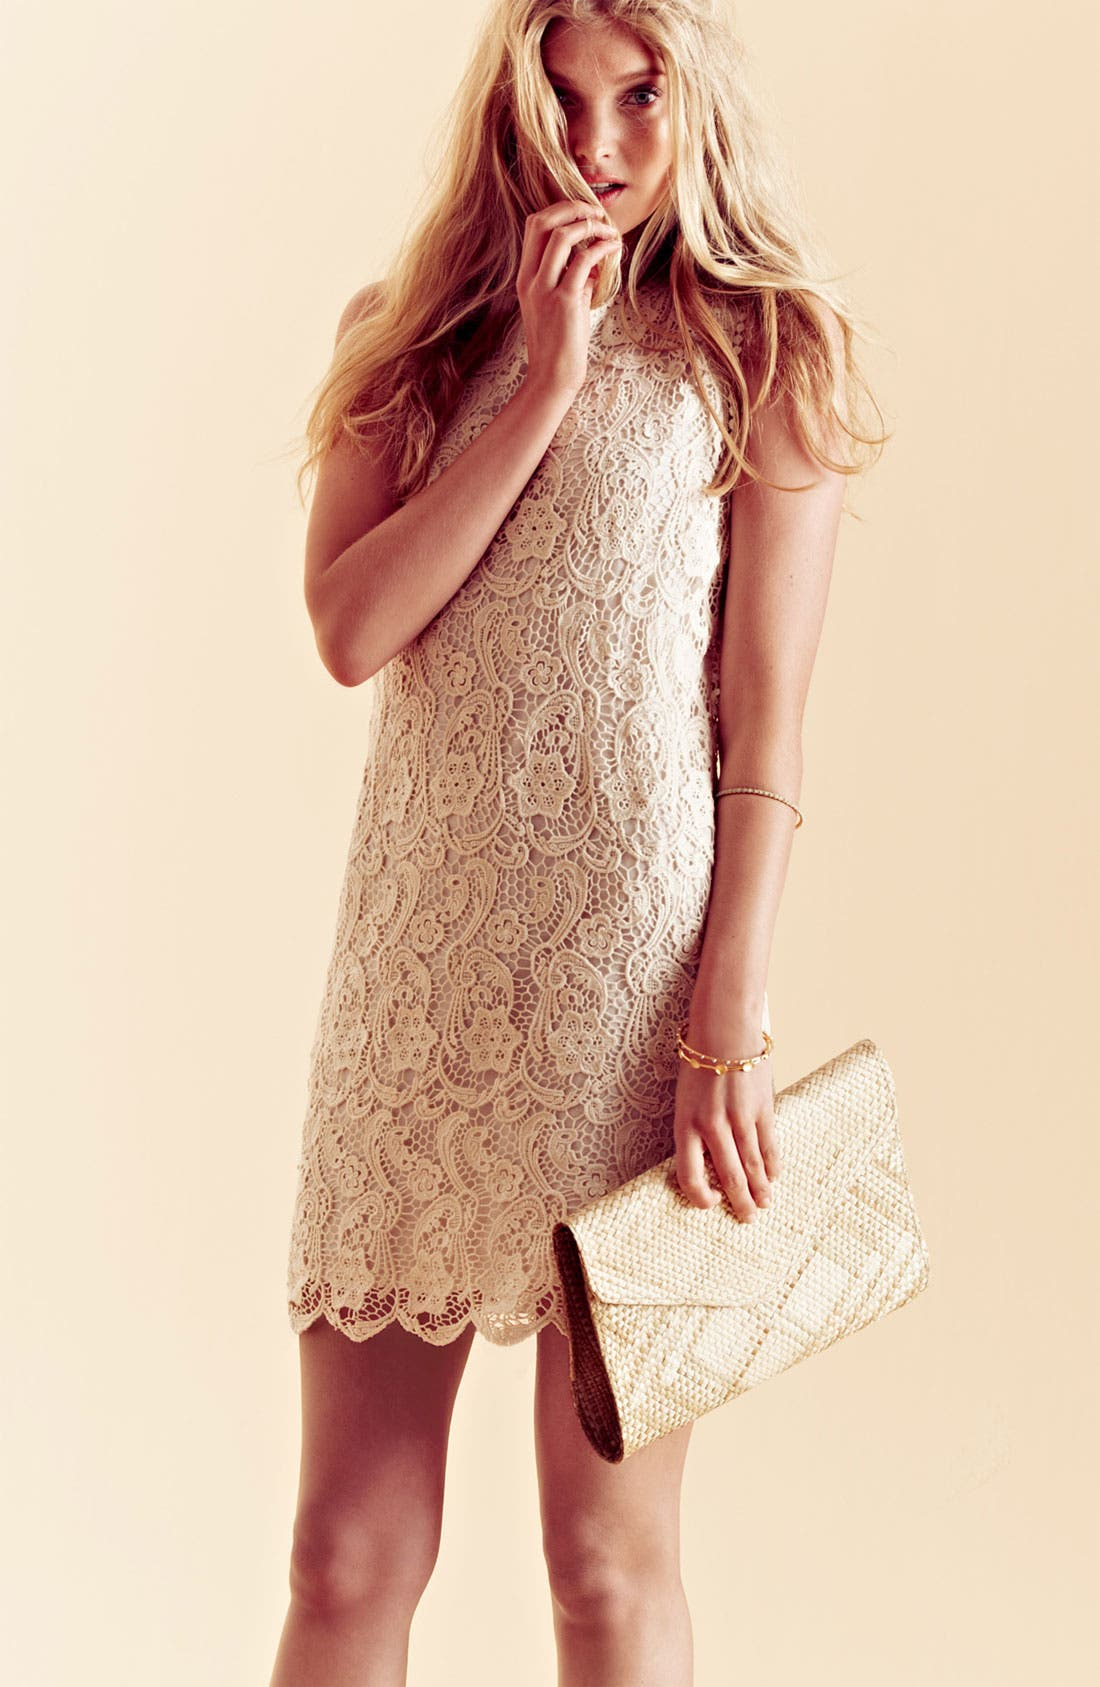 Main Image - Joie Shift Dress & Accessories